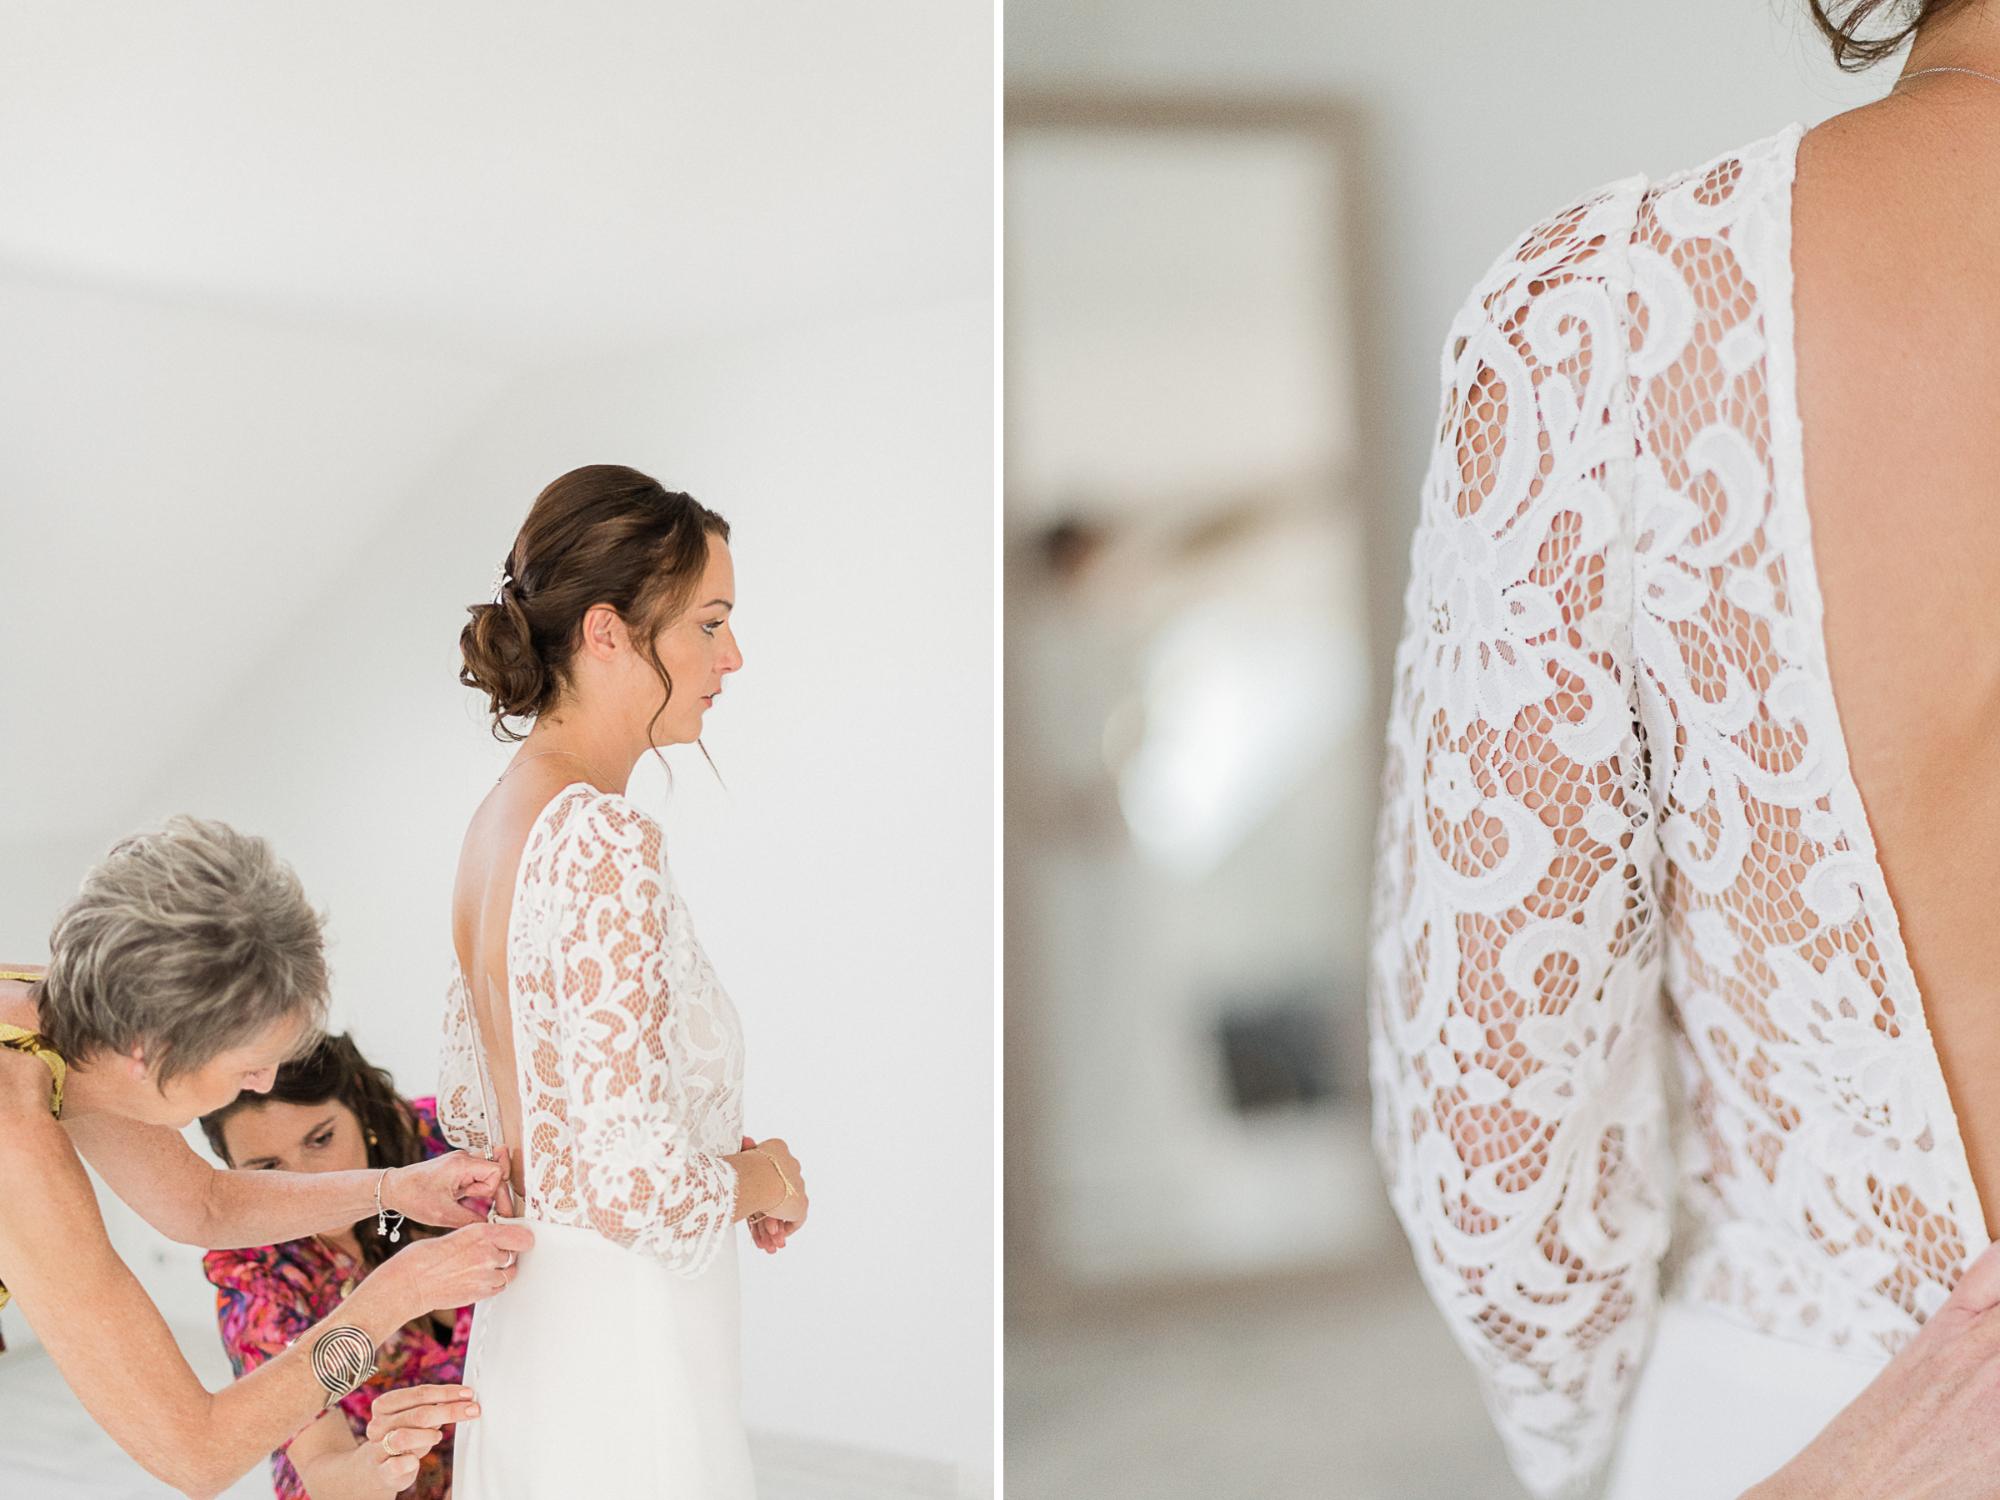 priscillapuzenat-photographe-mariage-bazoches-chateau-nievre-morvan-bourgogne-robe-preparatifs